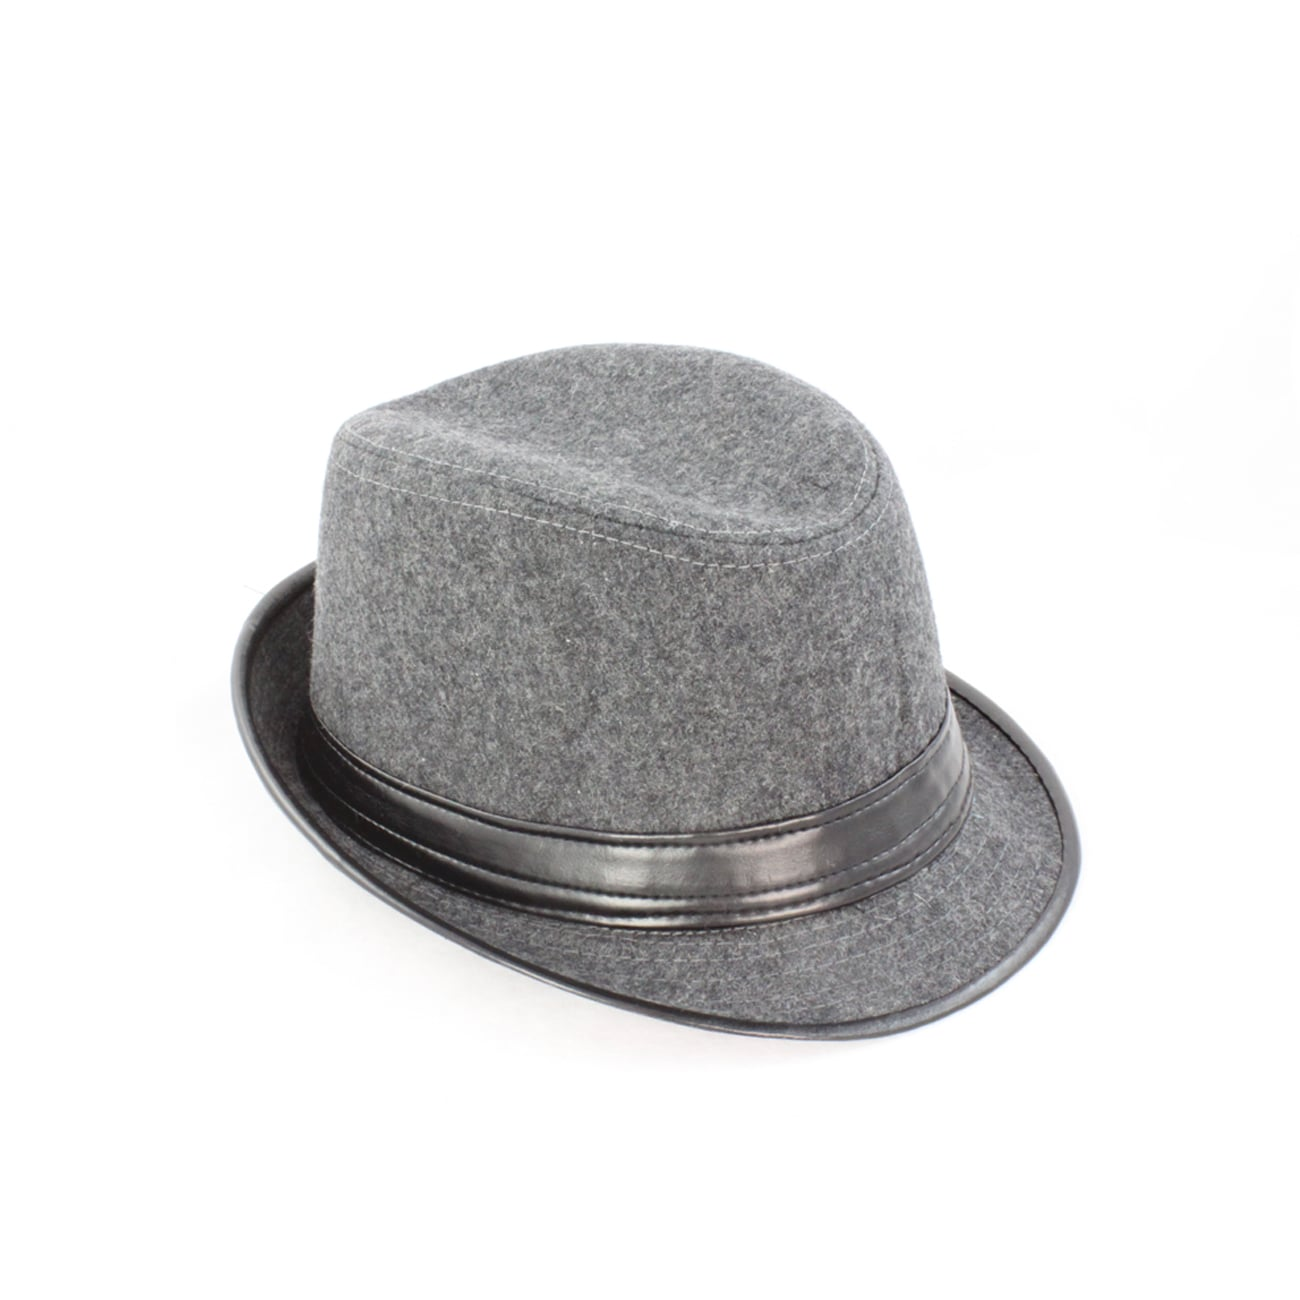 Faddism Men's 'Gentleman Grey' Wool Felt Fedora Hat